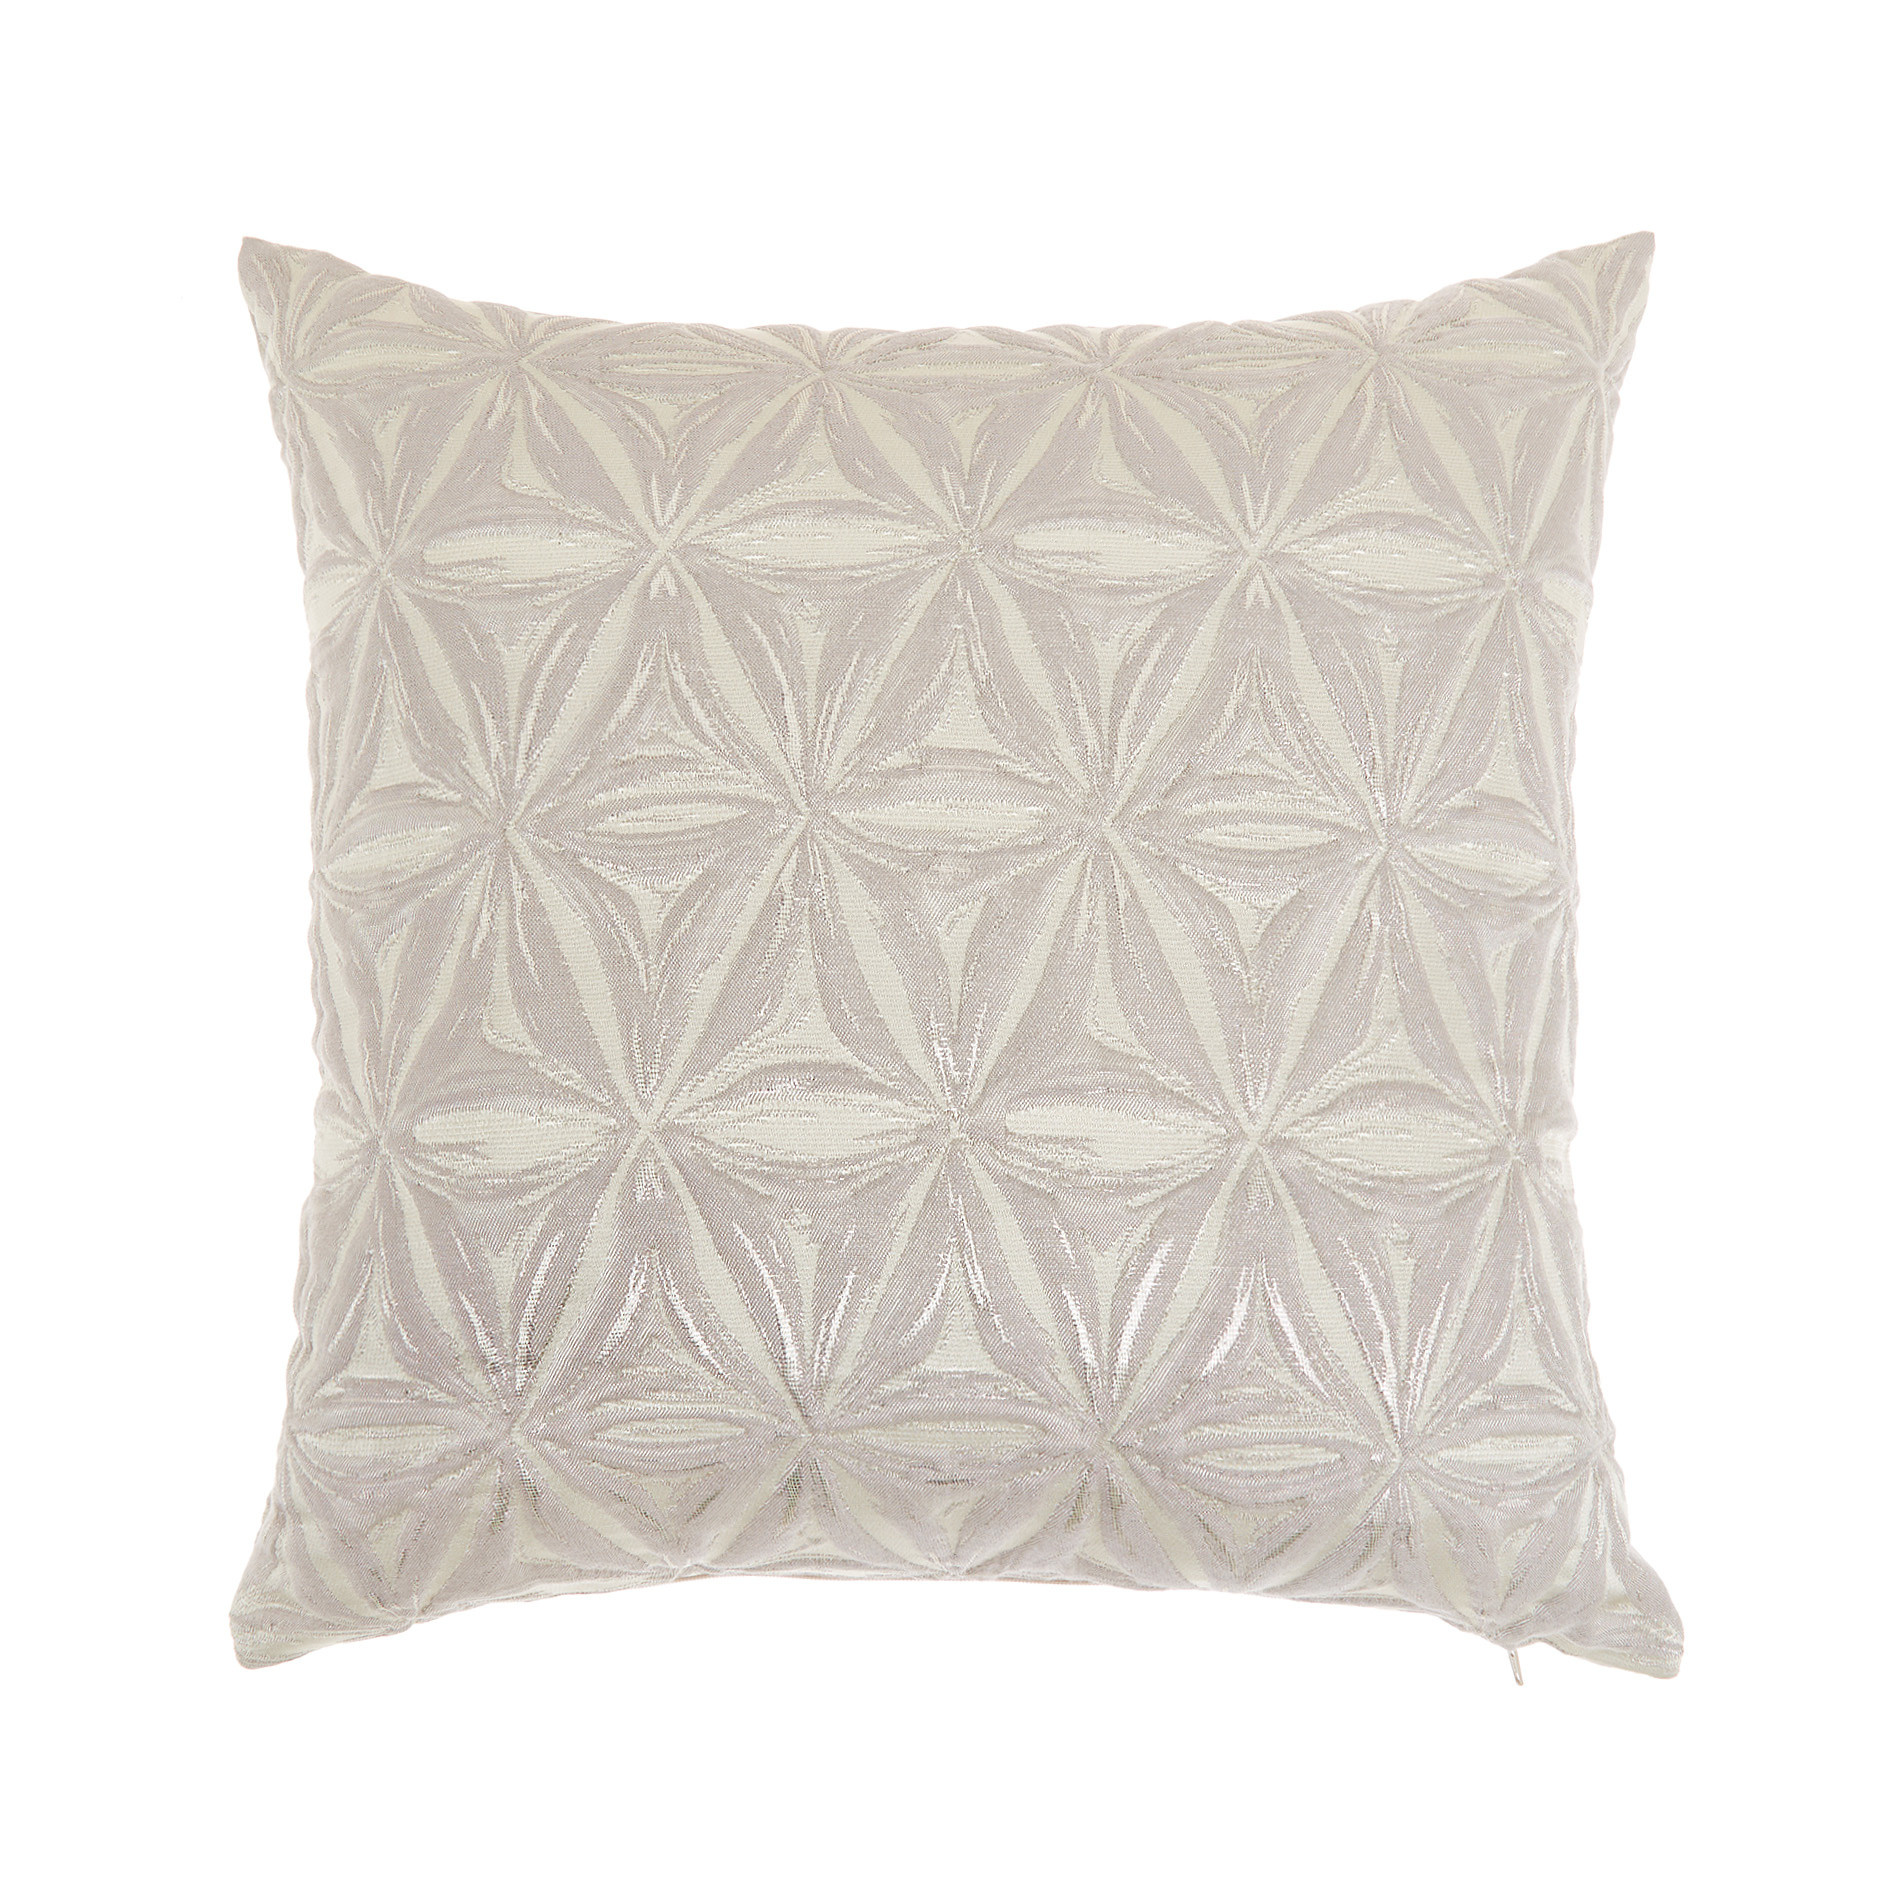 Cuscino jacquard motivi geometrici 45x45cm, Grigio chiaro, large image number 0